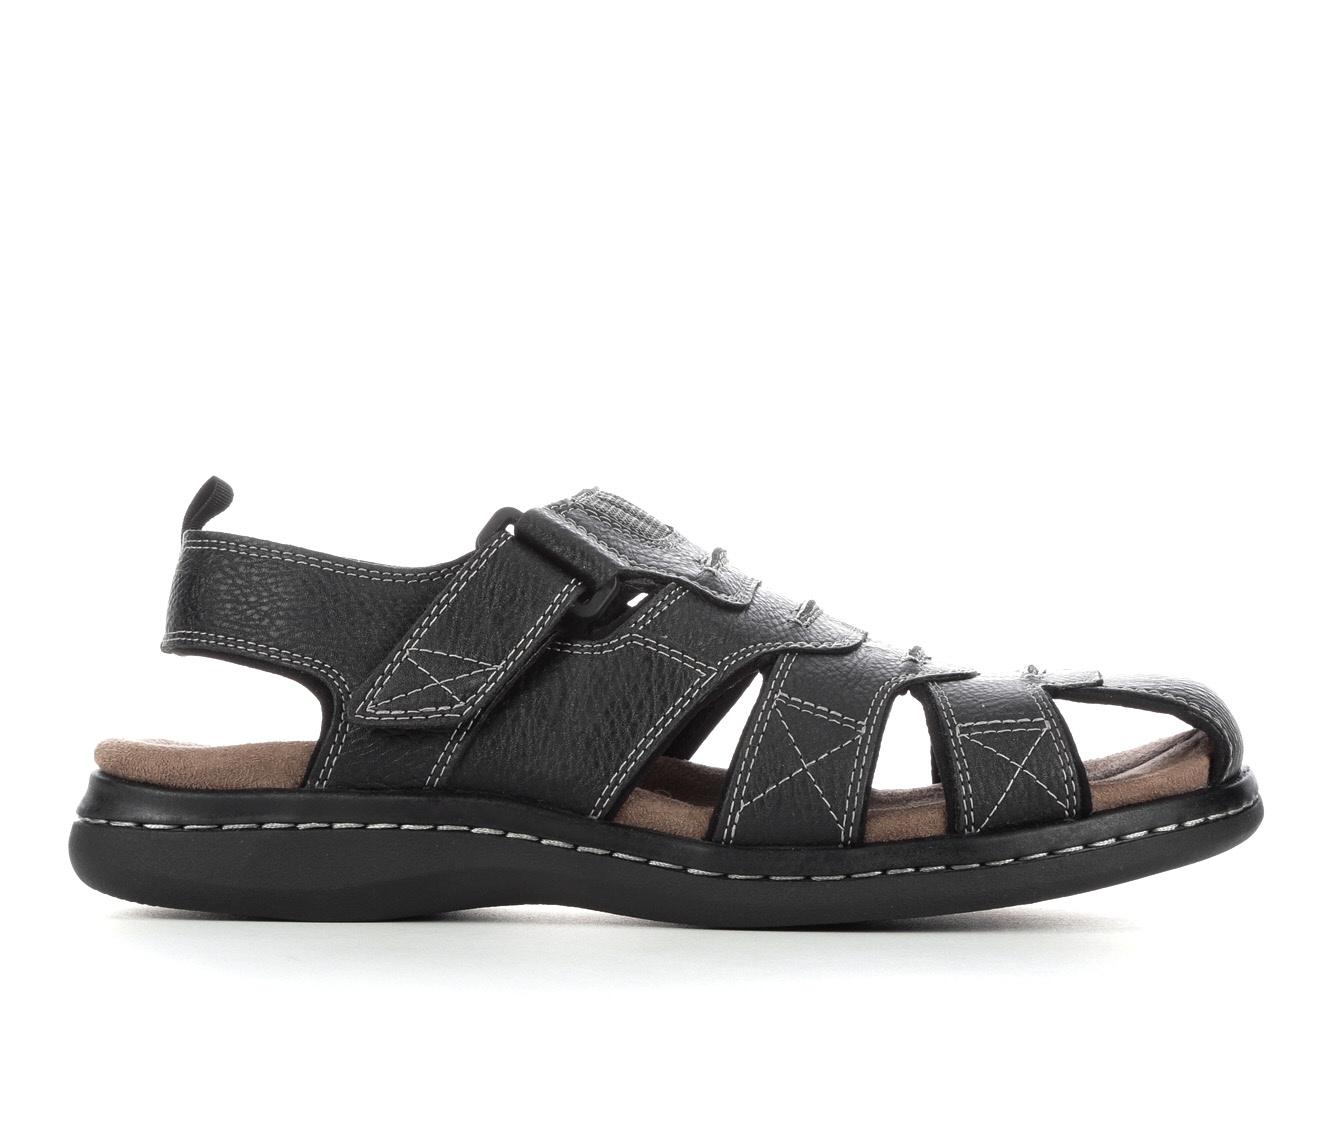 Men's Dockers Searose Sandals (Black)